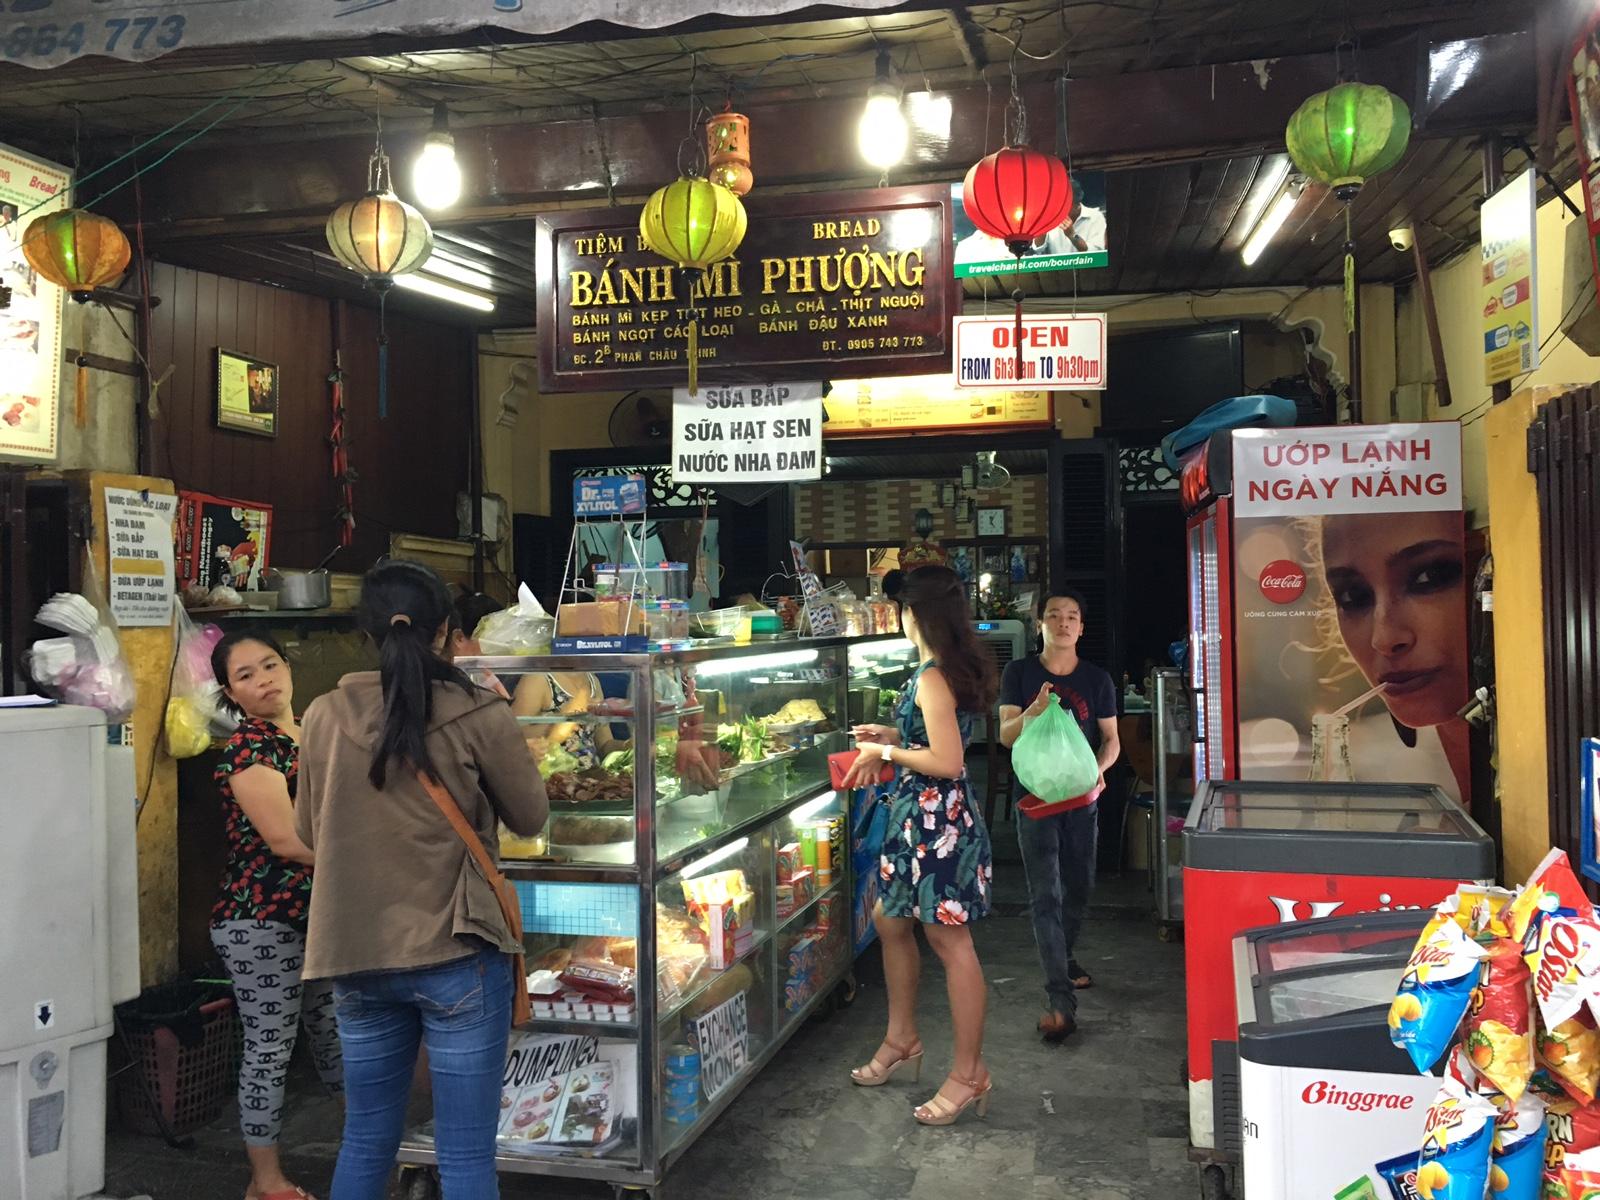 banh mi phuong, hoi an, vietnam - m.quigley